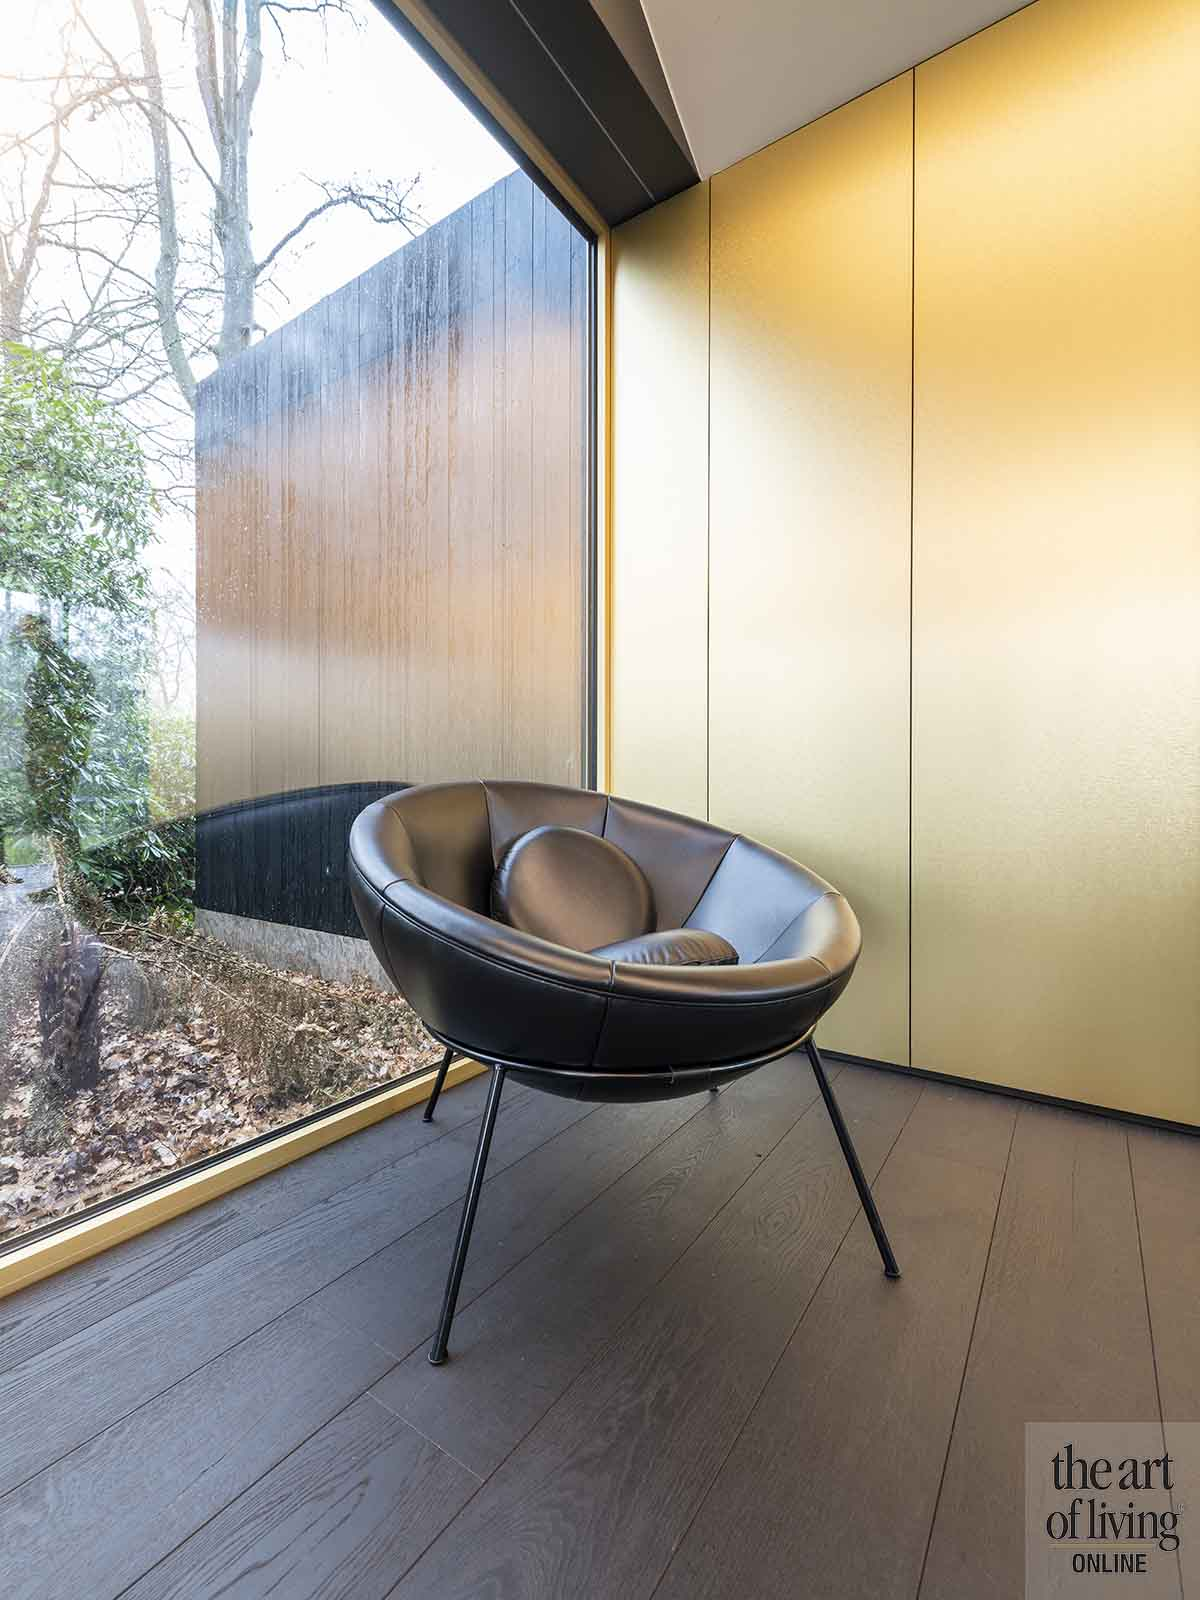 wonen in het bos | Basil Architecture, the art of living